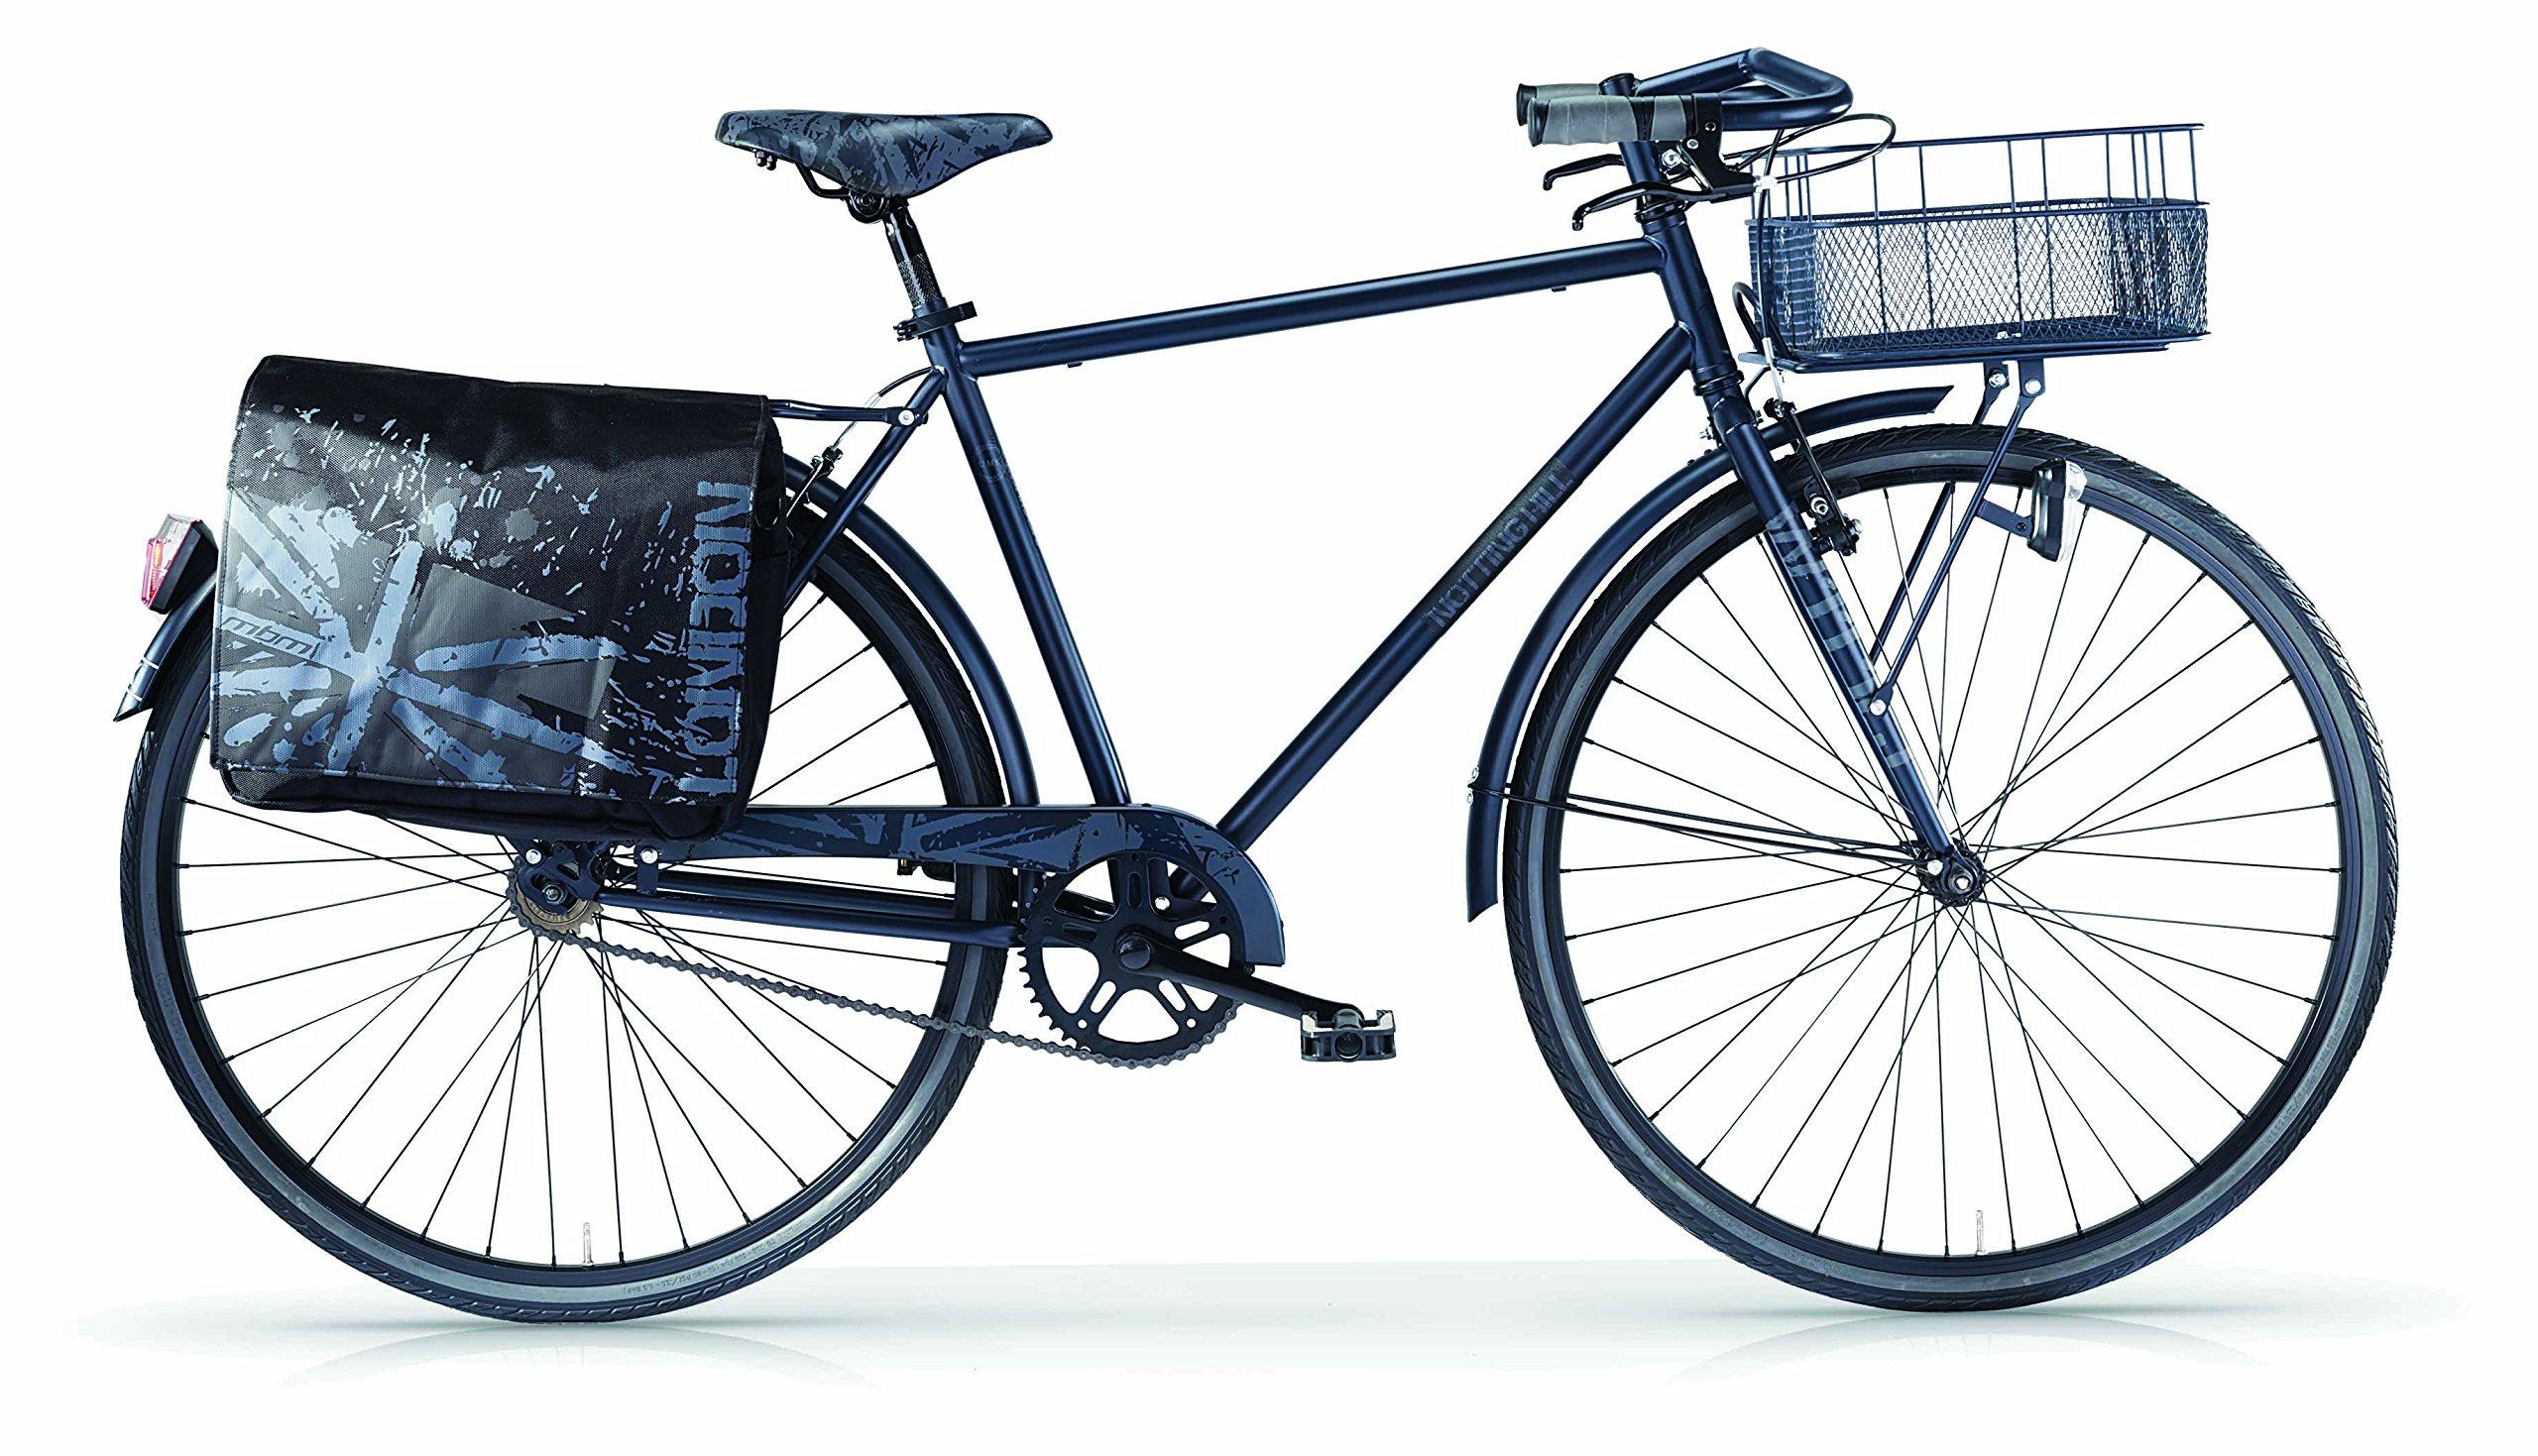 Bicicleta MBM Notting Hill para hombres, cuadro de acero, 28 ...